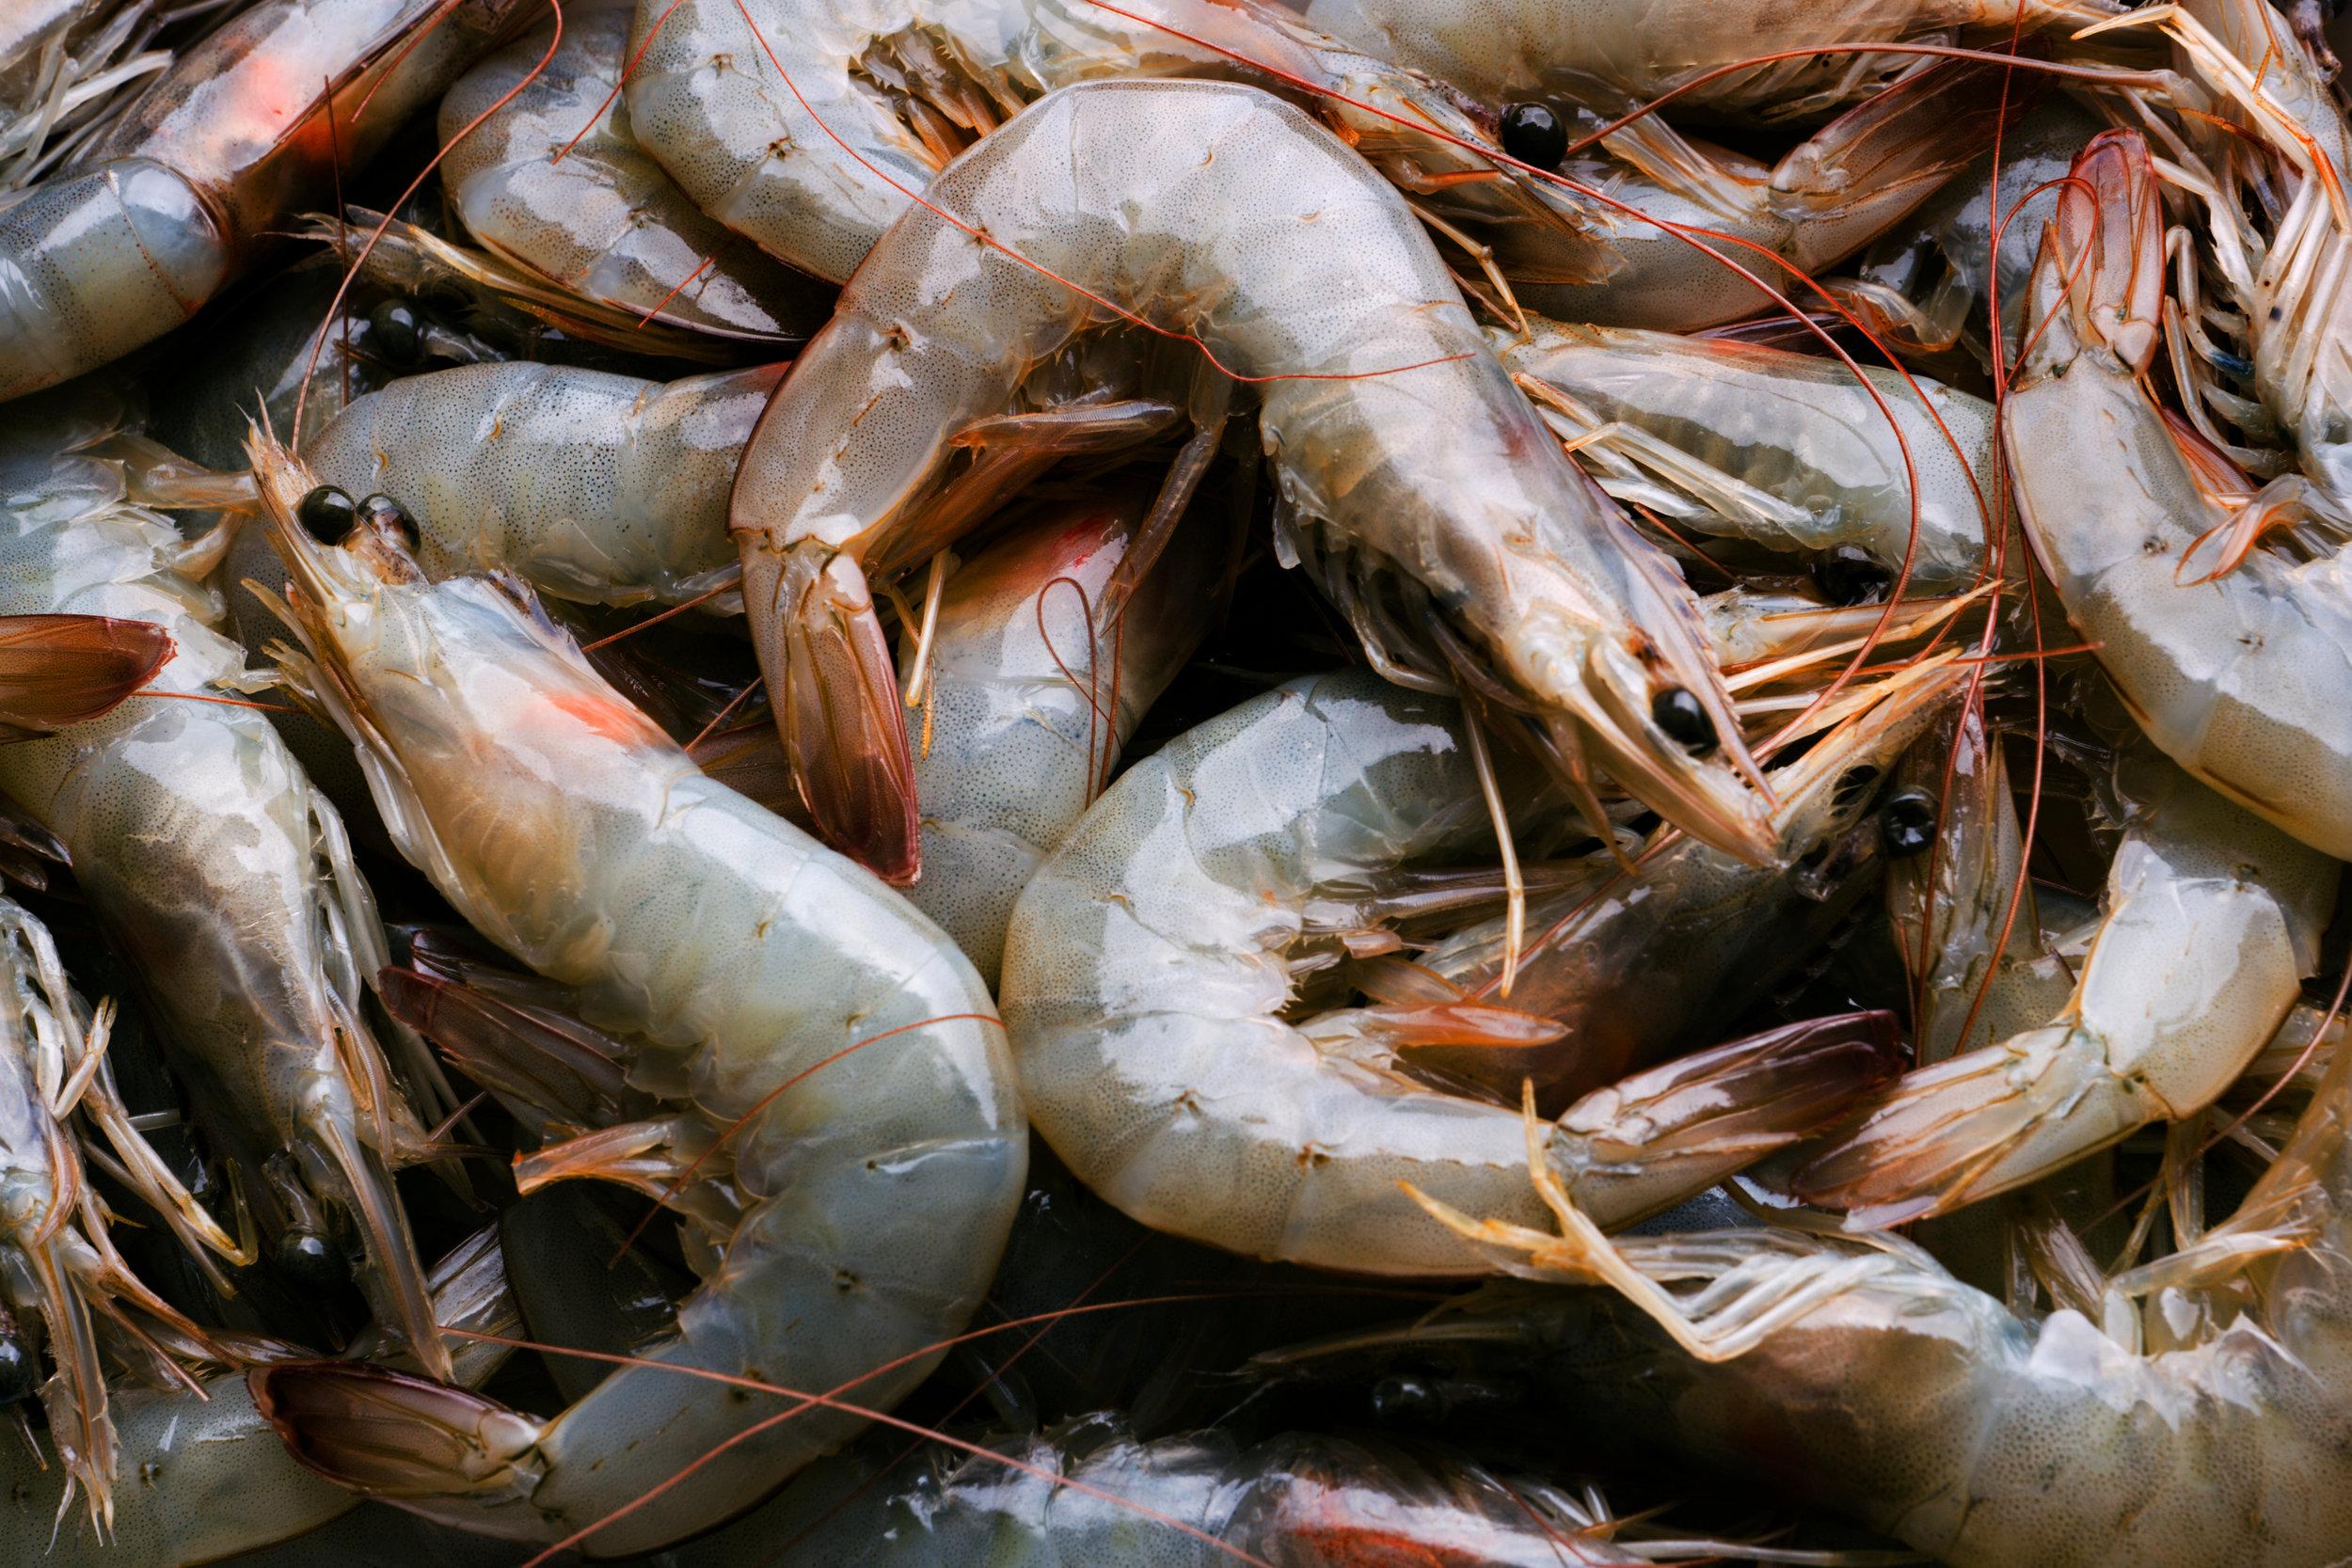 SquarespaceImage19-marinefisheries-shrimp.jpg